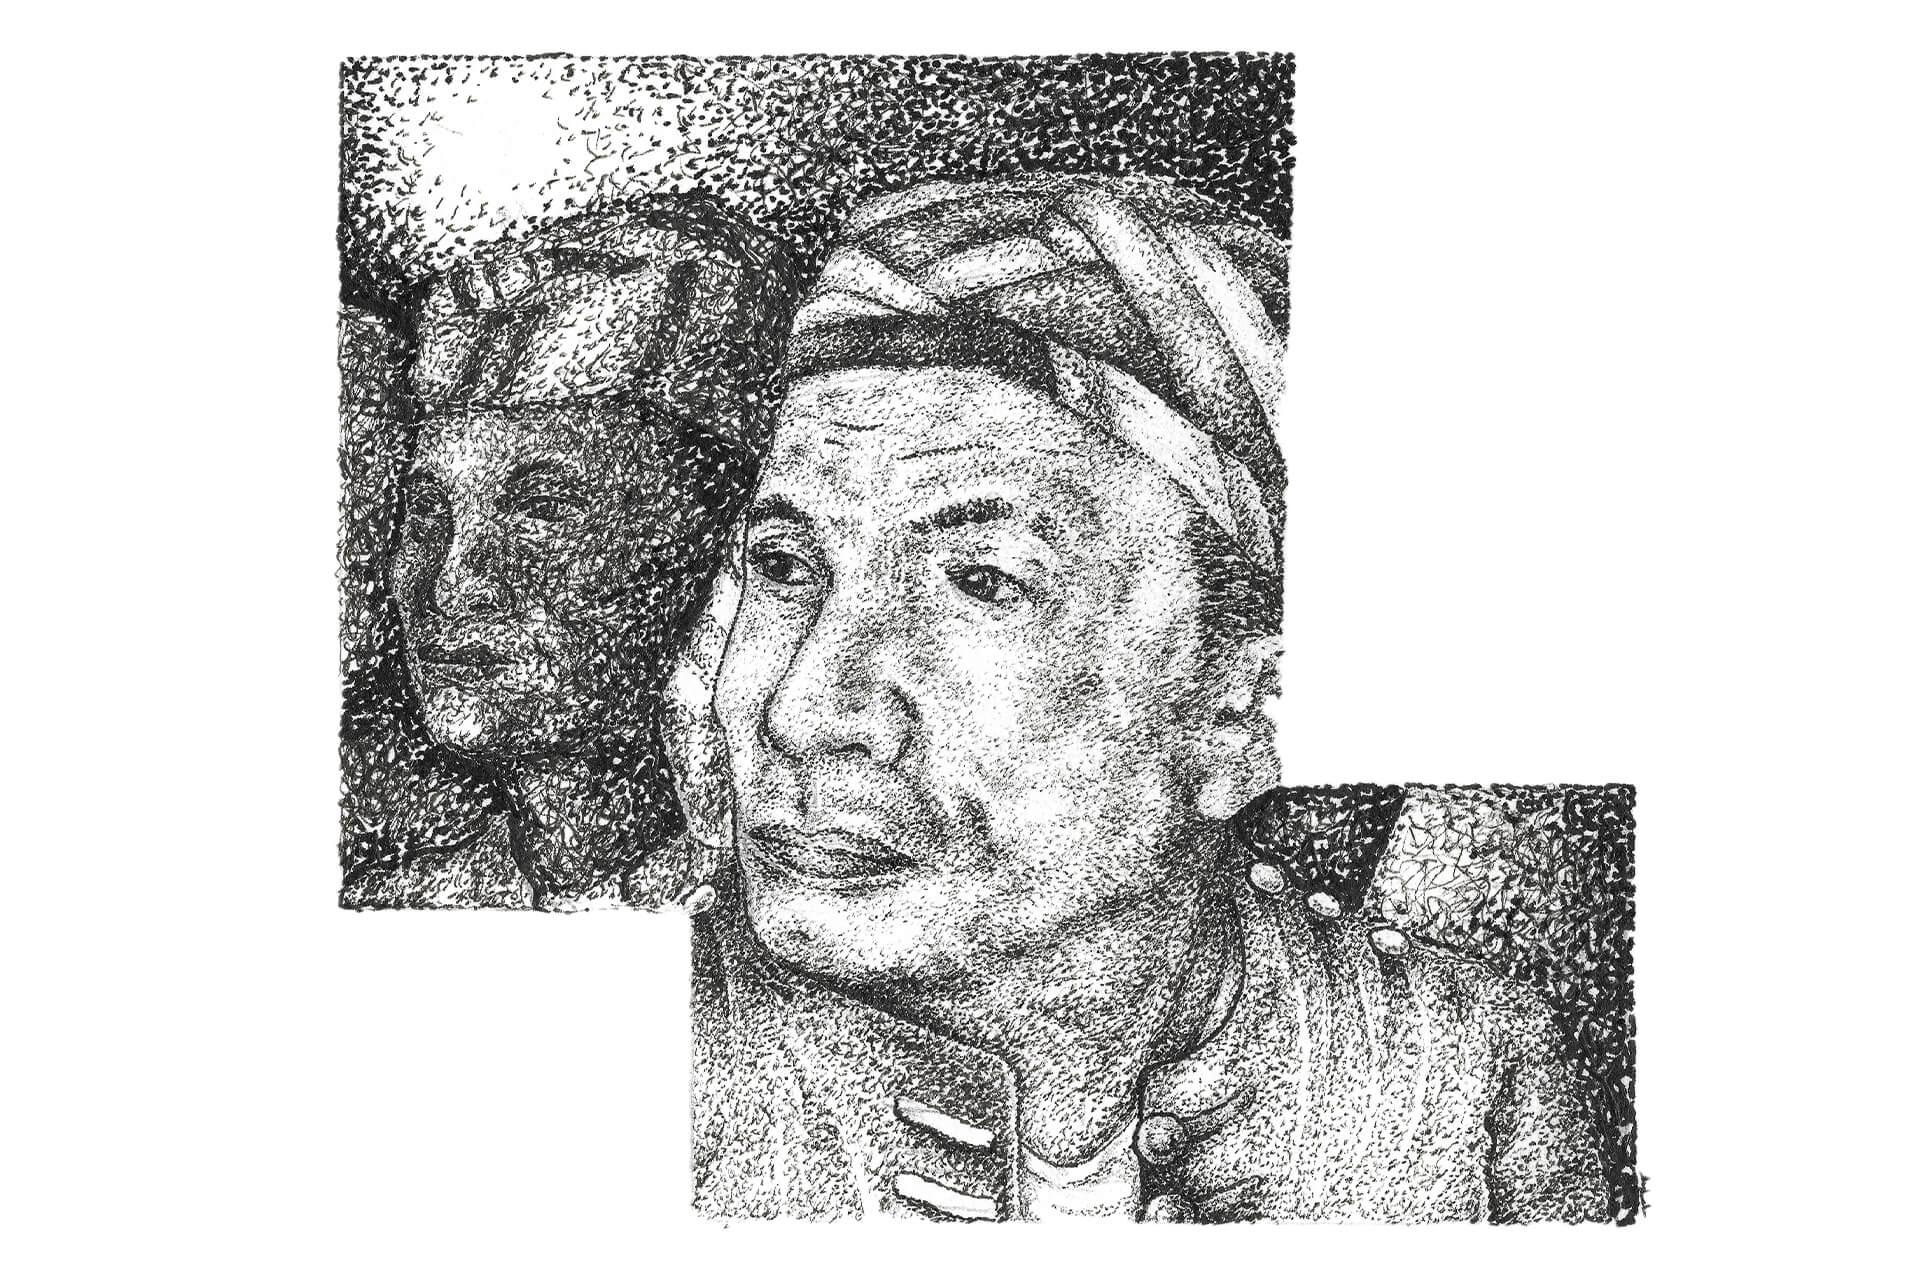 Sabil Moro Fighters Muslim Mindanao, illustration by Angelo Esperanzate